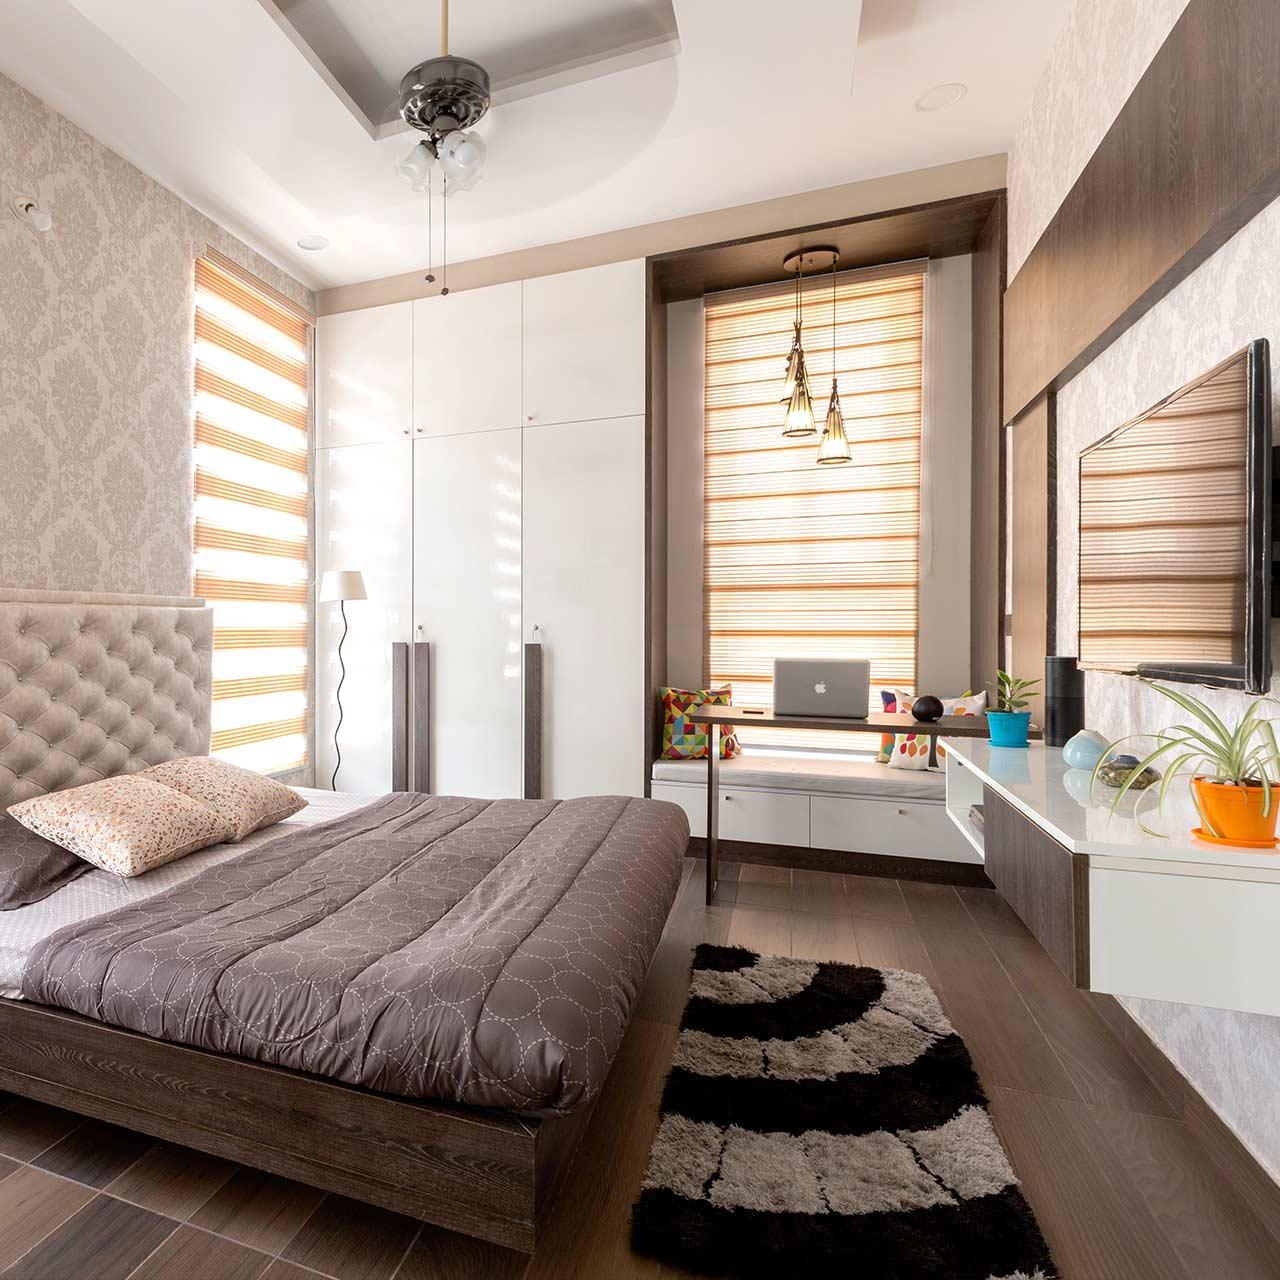 5 Smart Ways To Spice Up Your Bedroom Design Cafe